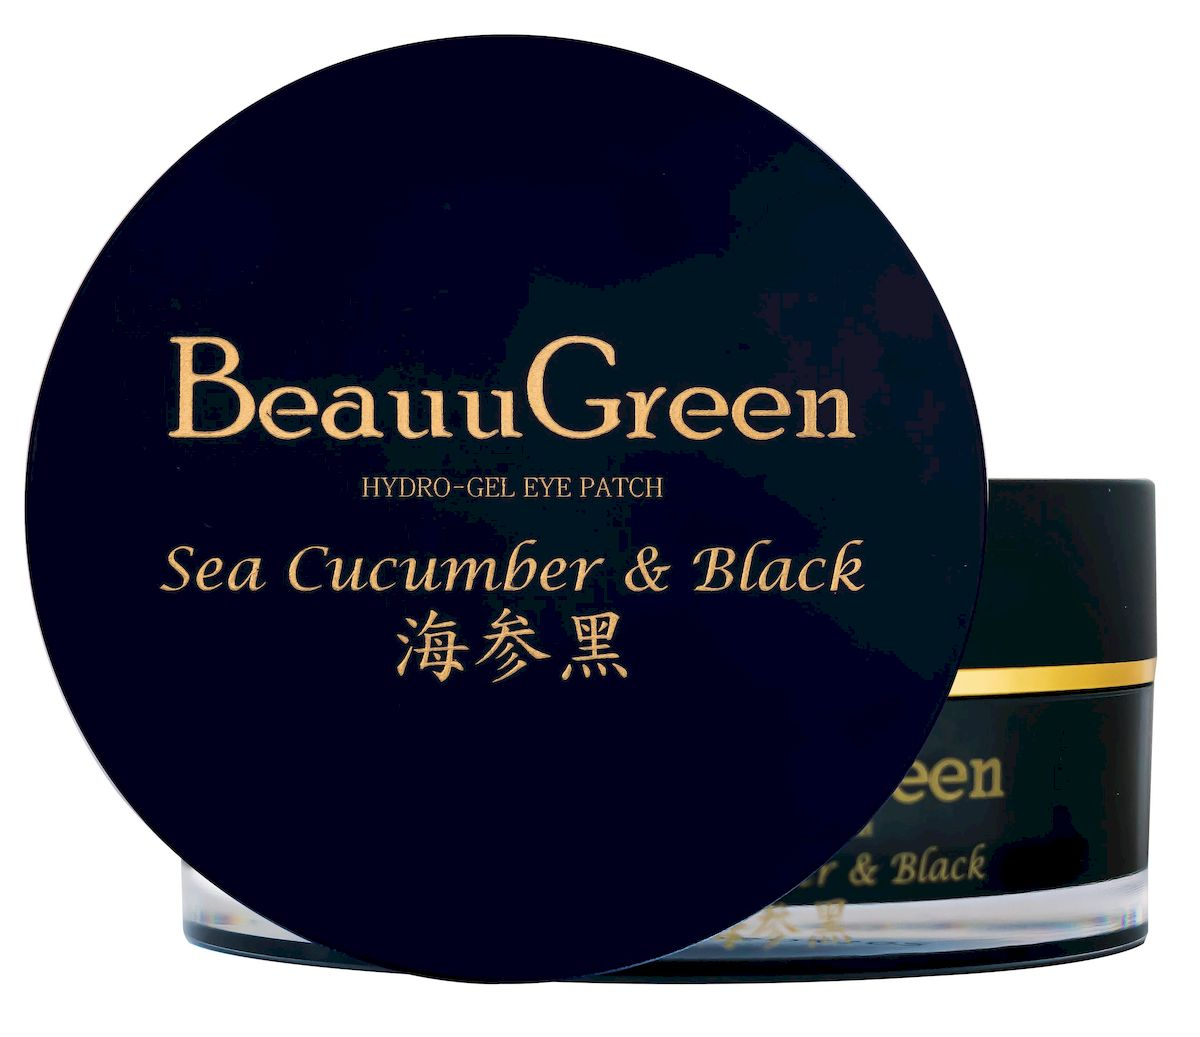 BeauuGreen Гидрогелевые патчи для кожи вокруг глаз Sea Cucumber & Black Hydrogel Eye Patch, 90 г kocostar гидрогелевые патчи для глаз princess eye patch gold 3 гр